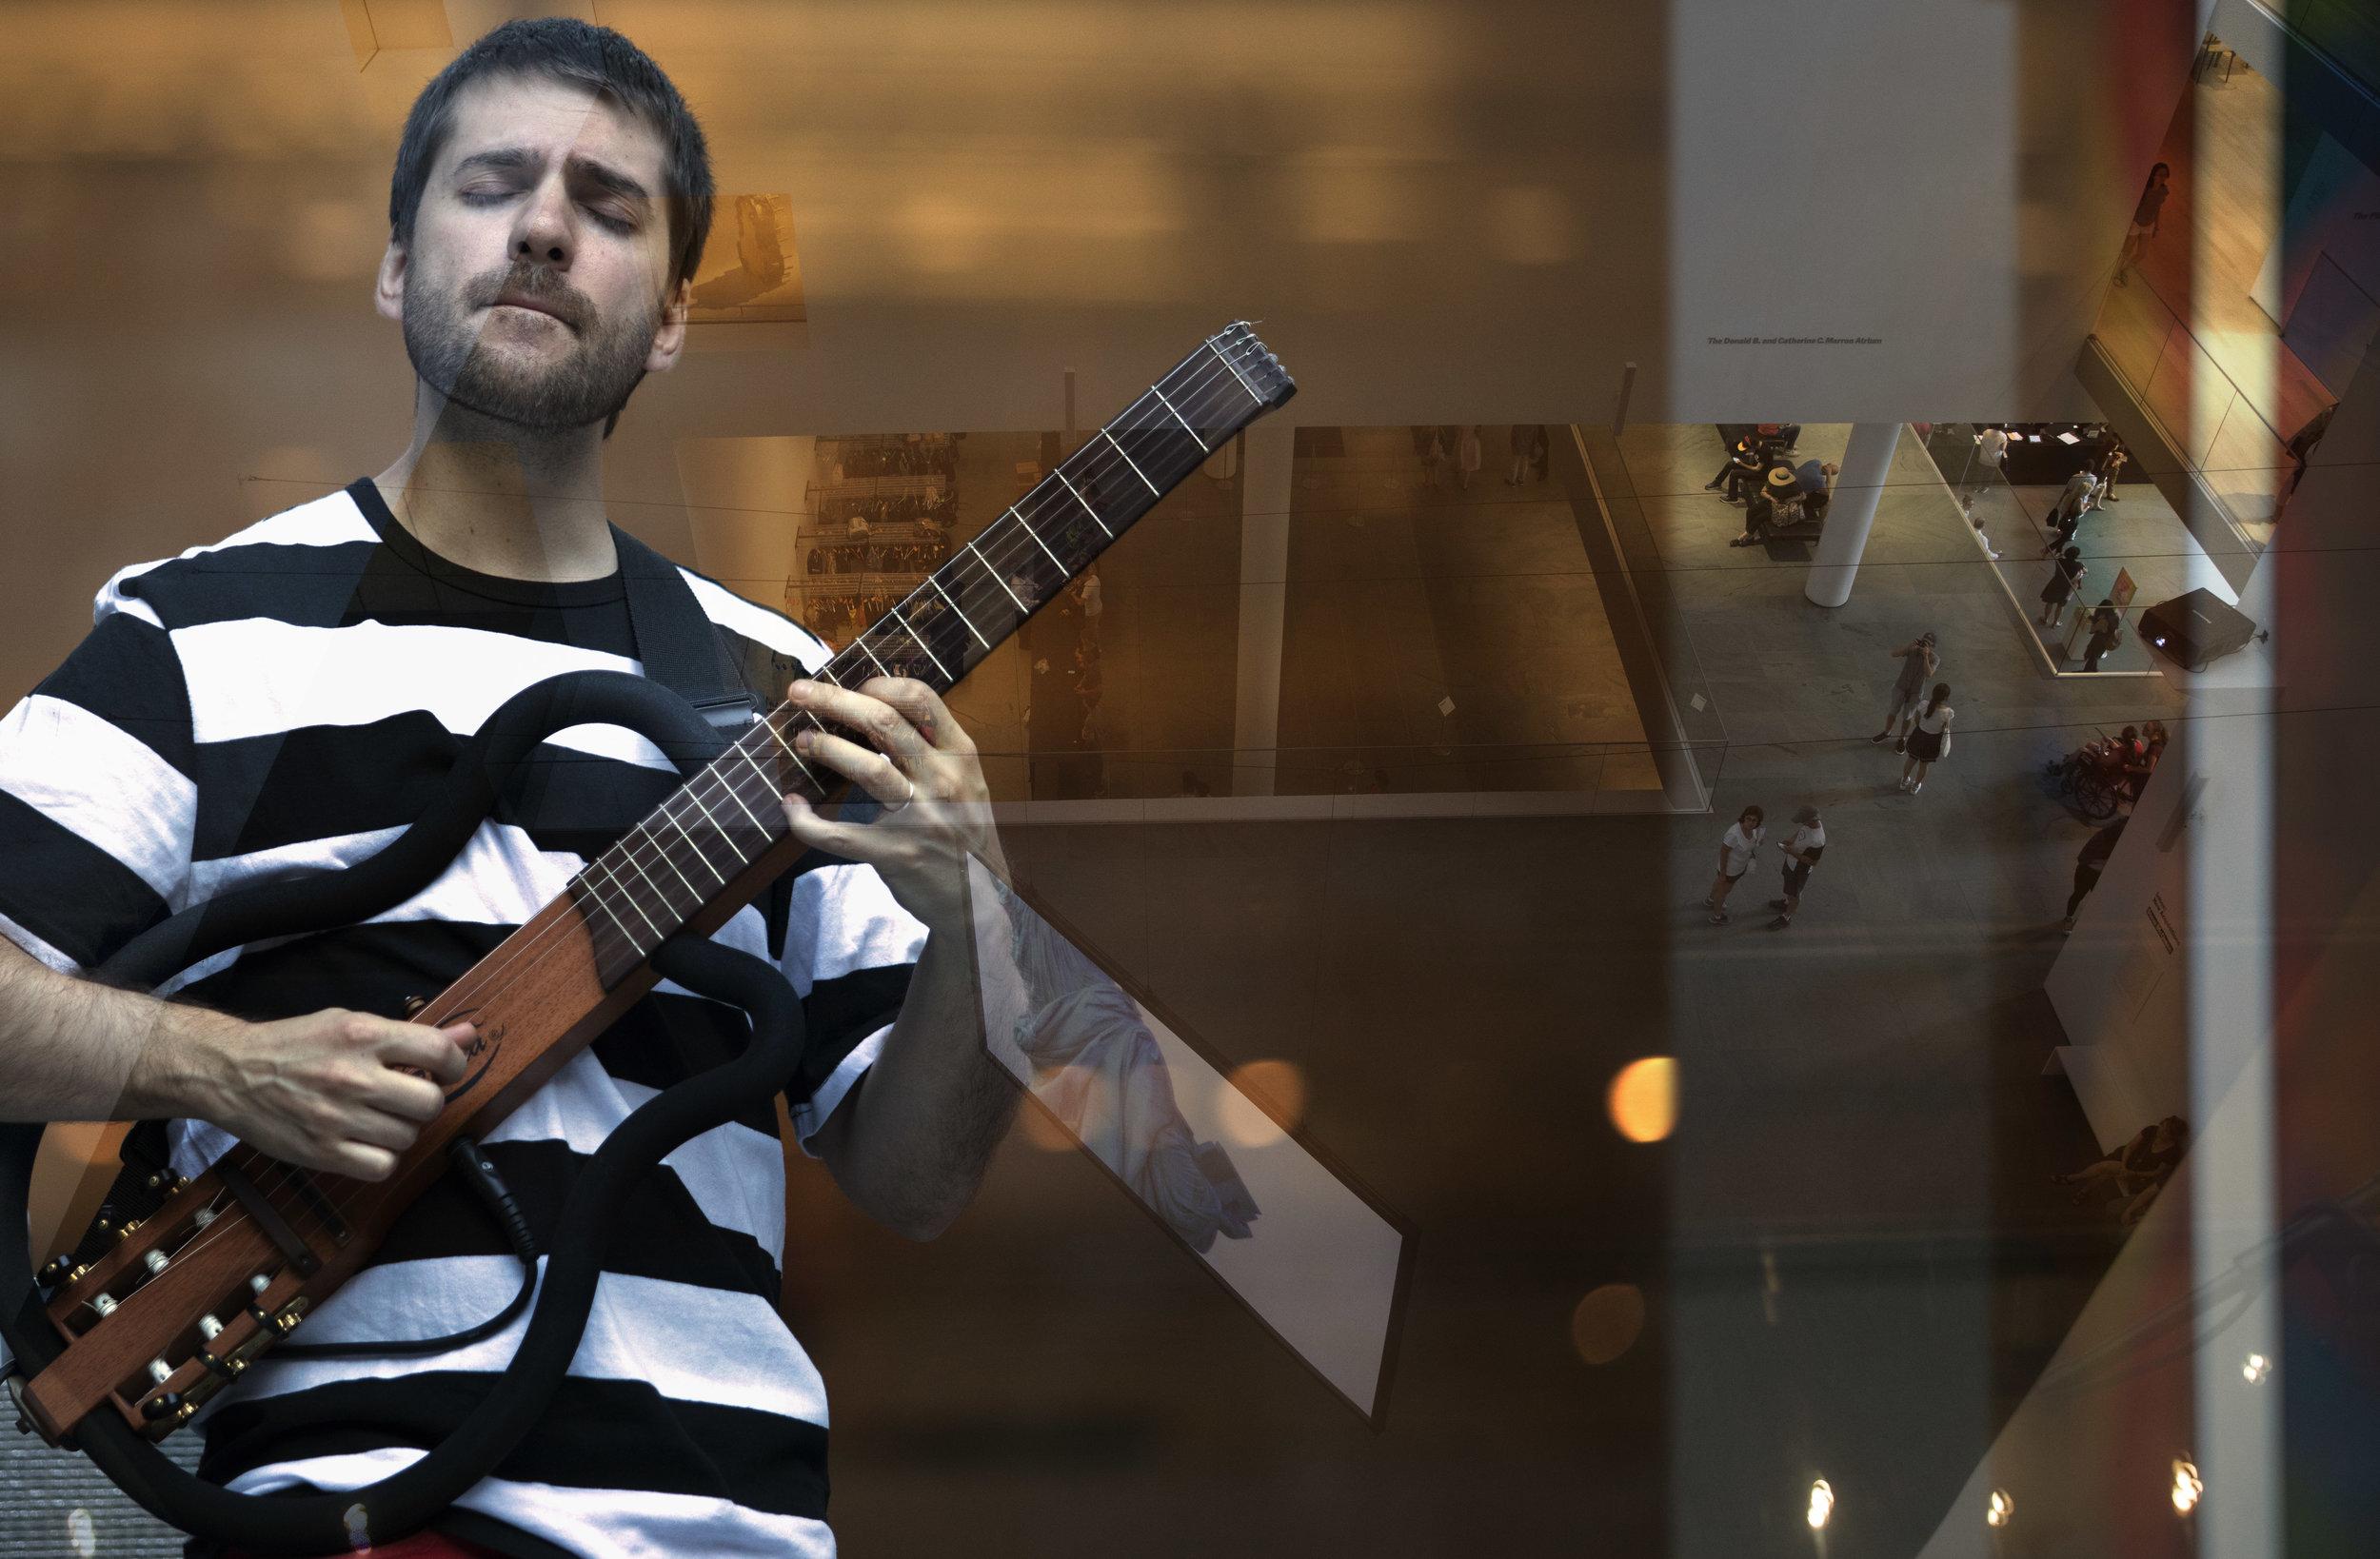 09. Guitar Player.jpg